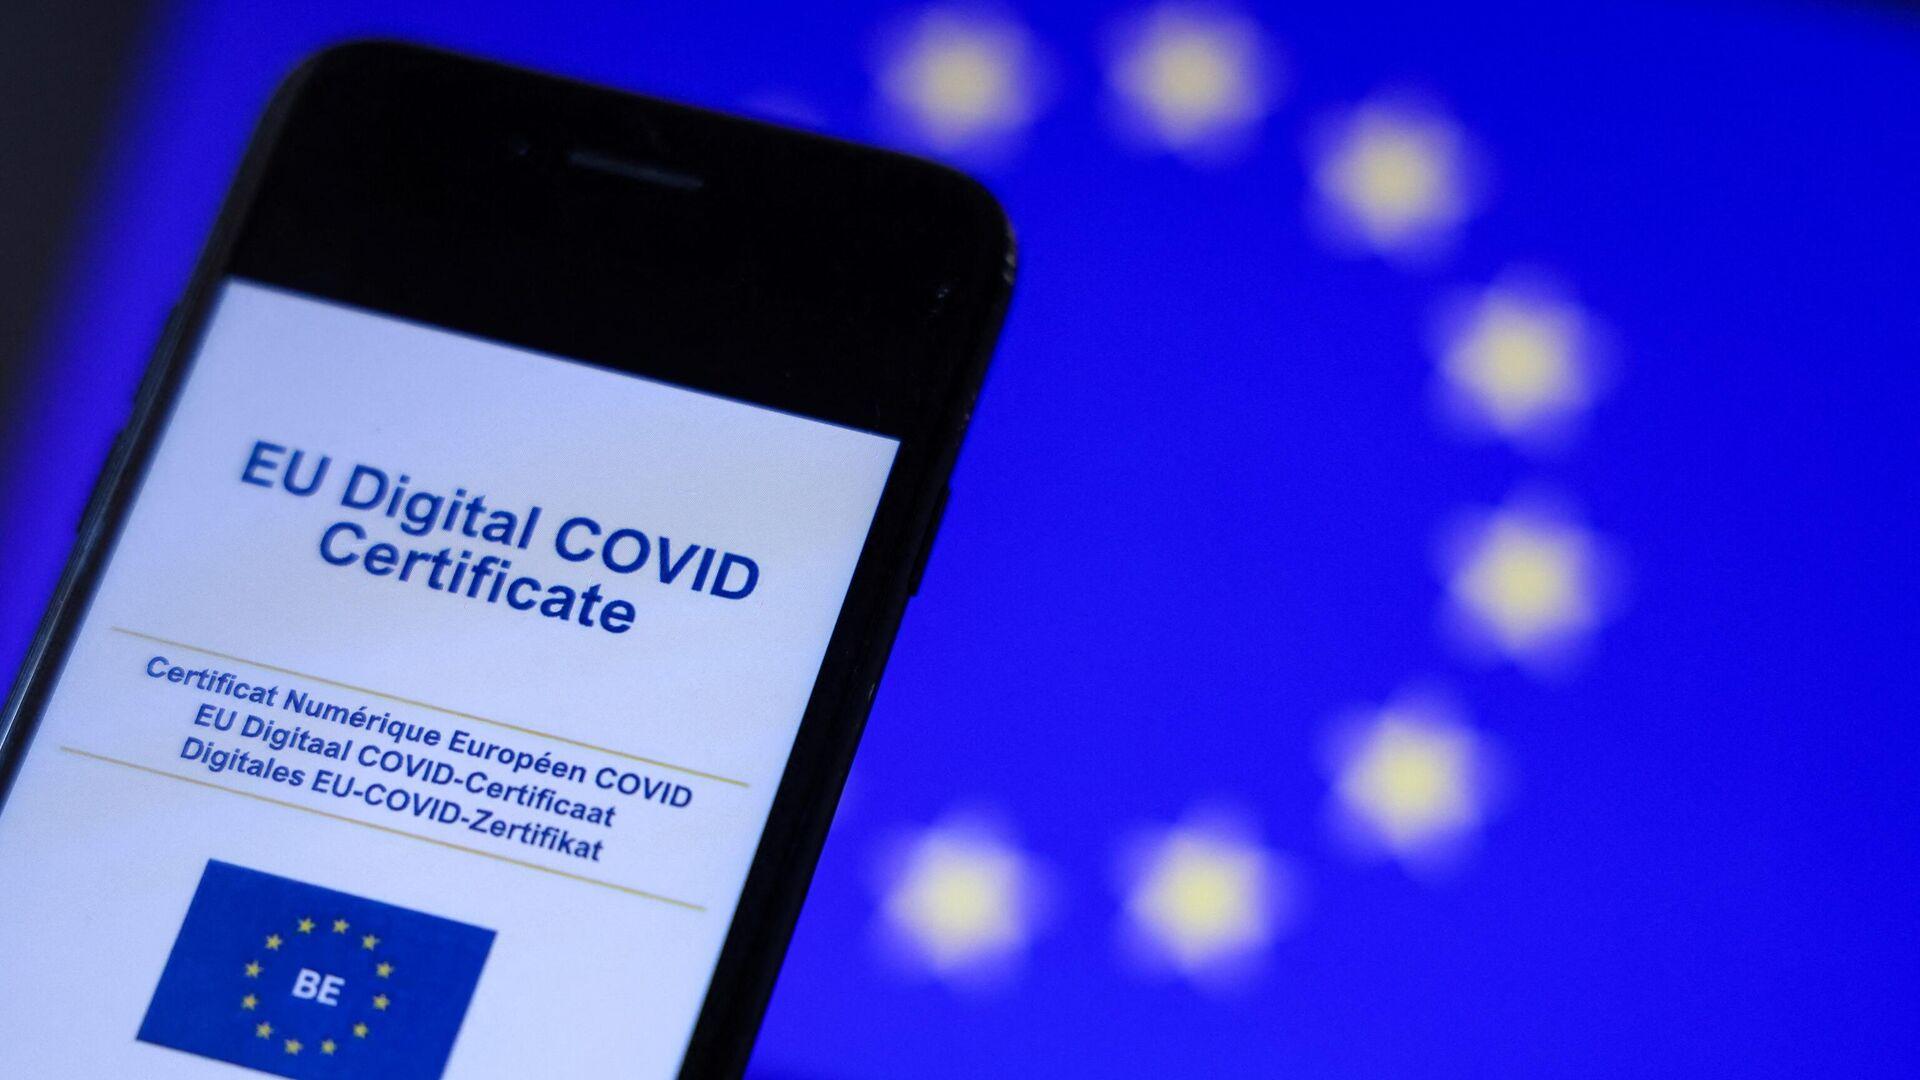 Certificado COVID digital de la Unión Europea - Sputnik Mundo, 1920, 06.08.2021